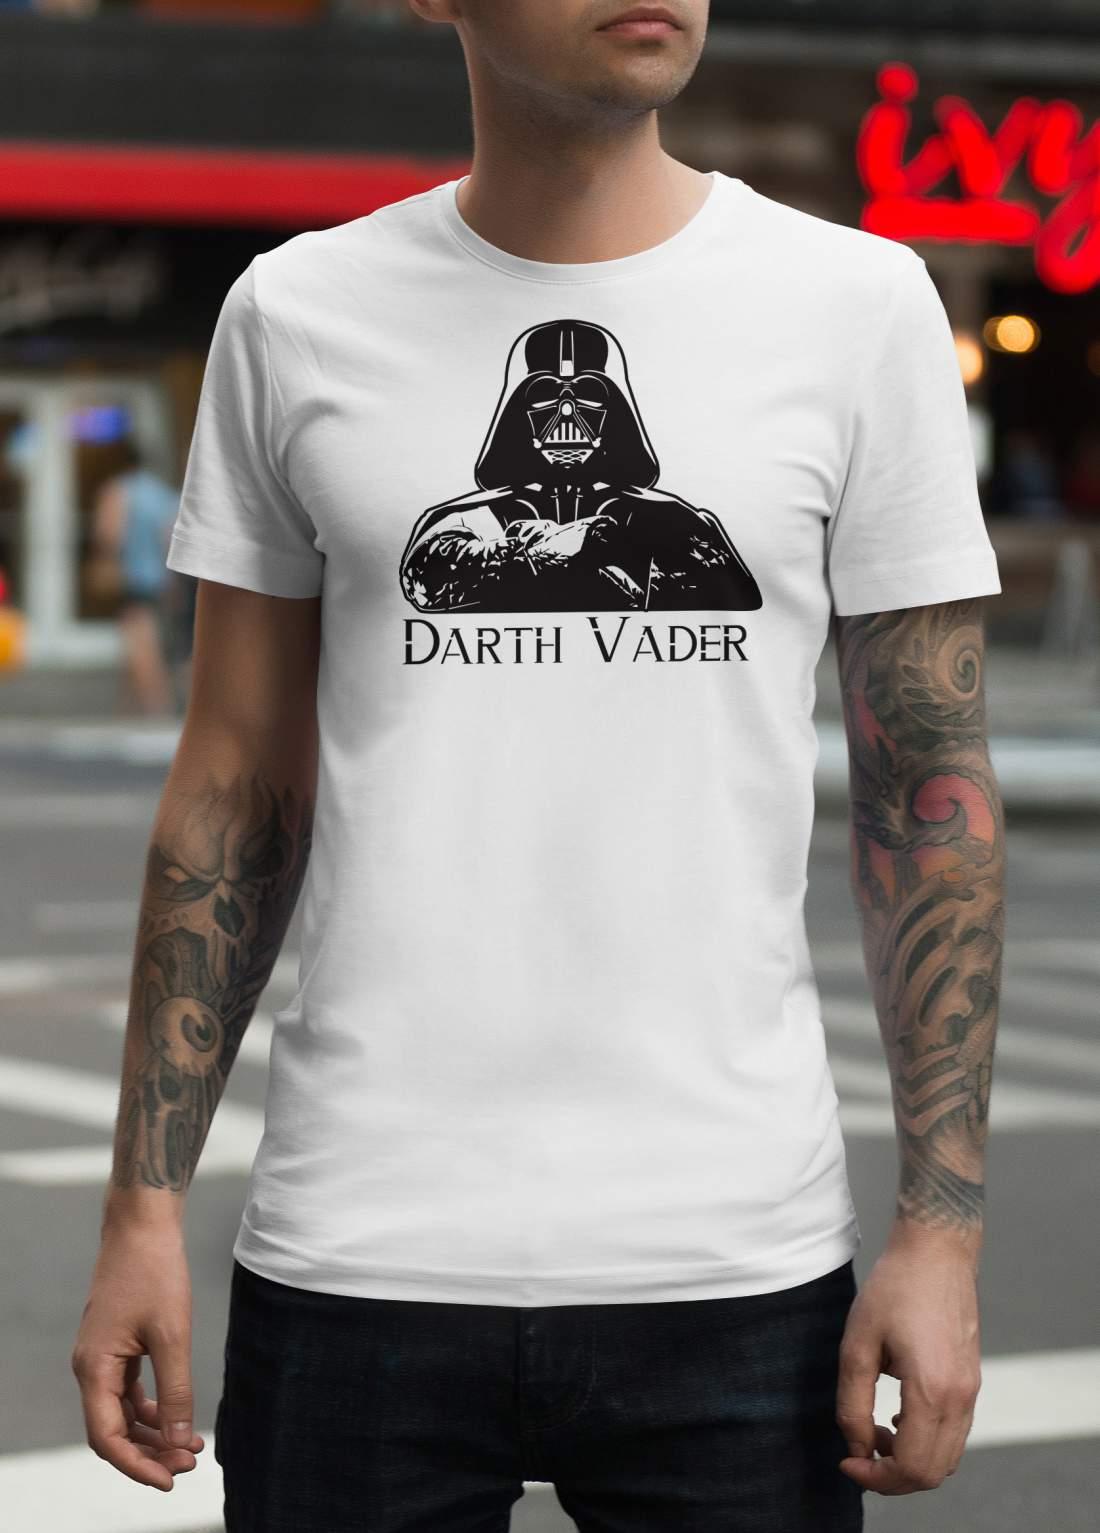 Darth Vader 2 férfi póló fehér